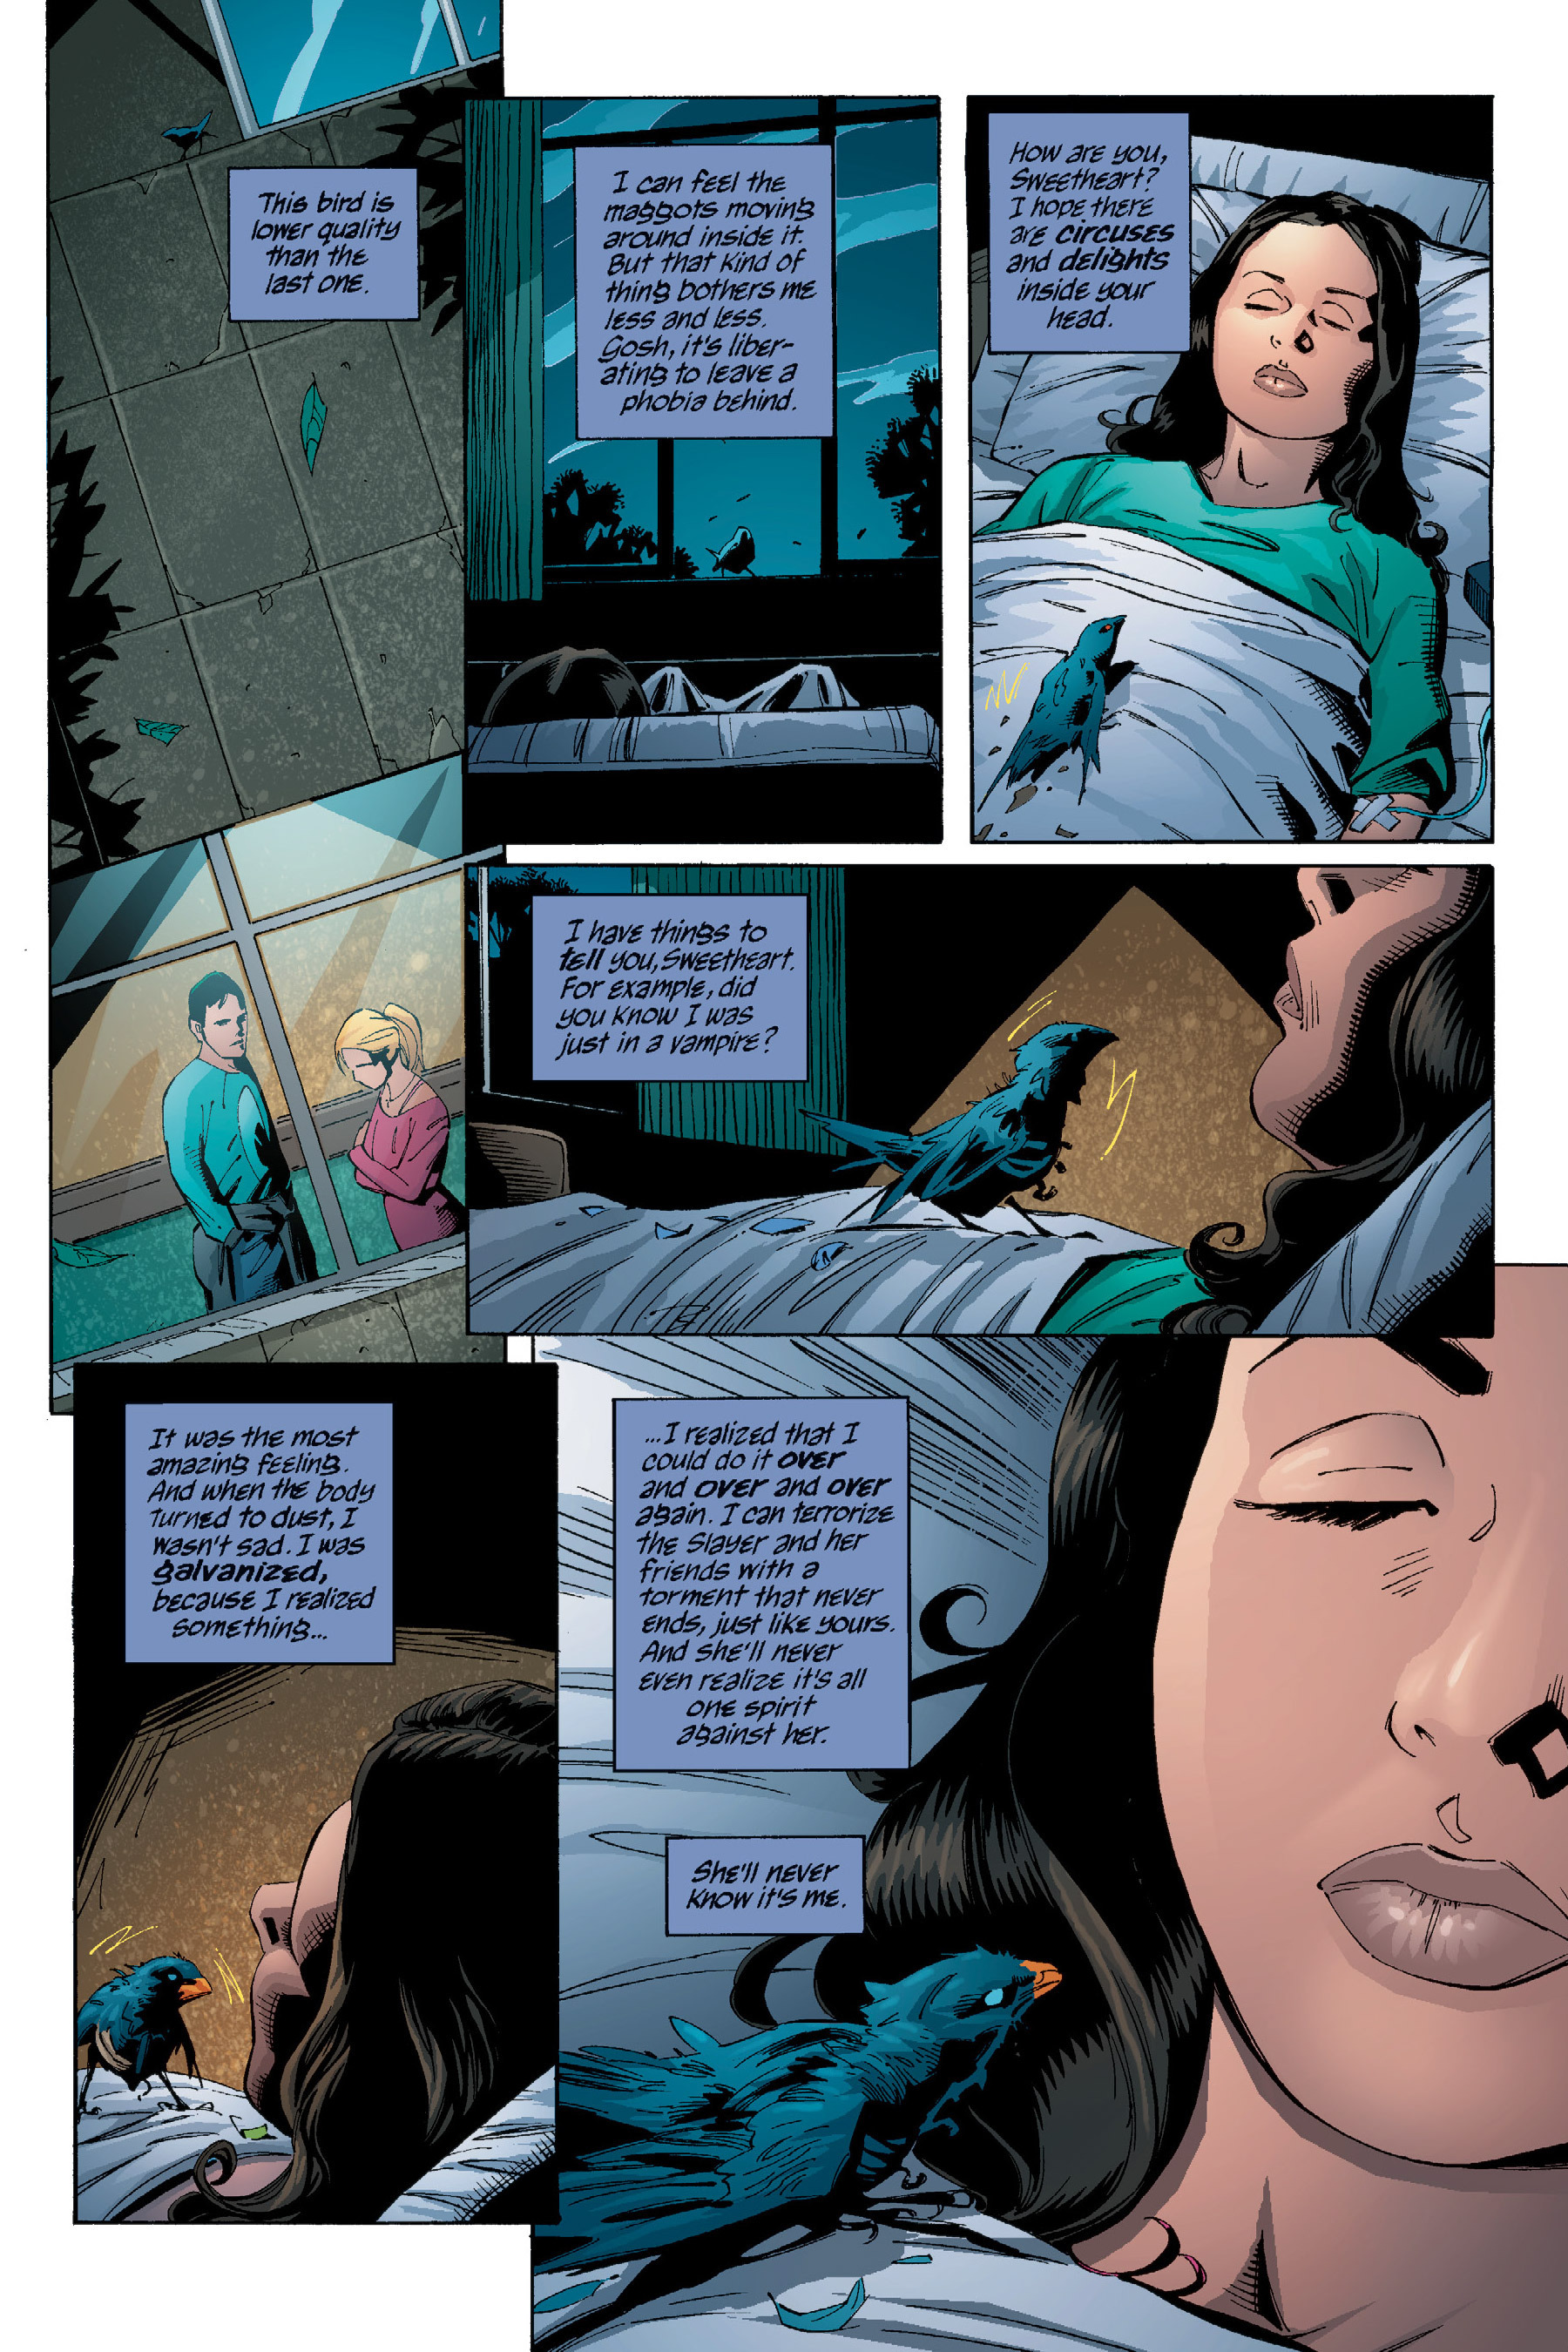 Read online Buffy the Vampire Slayer: Omnibus comic -  Issue # TPB 5 - 37